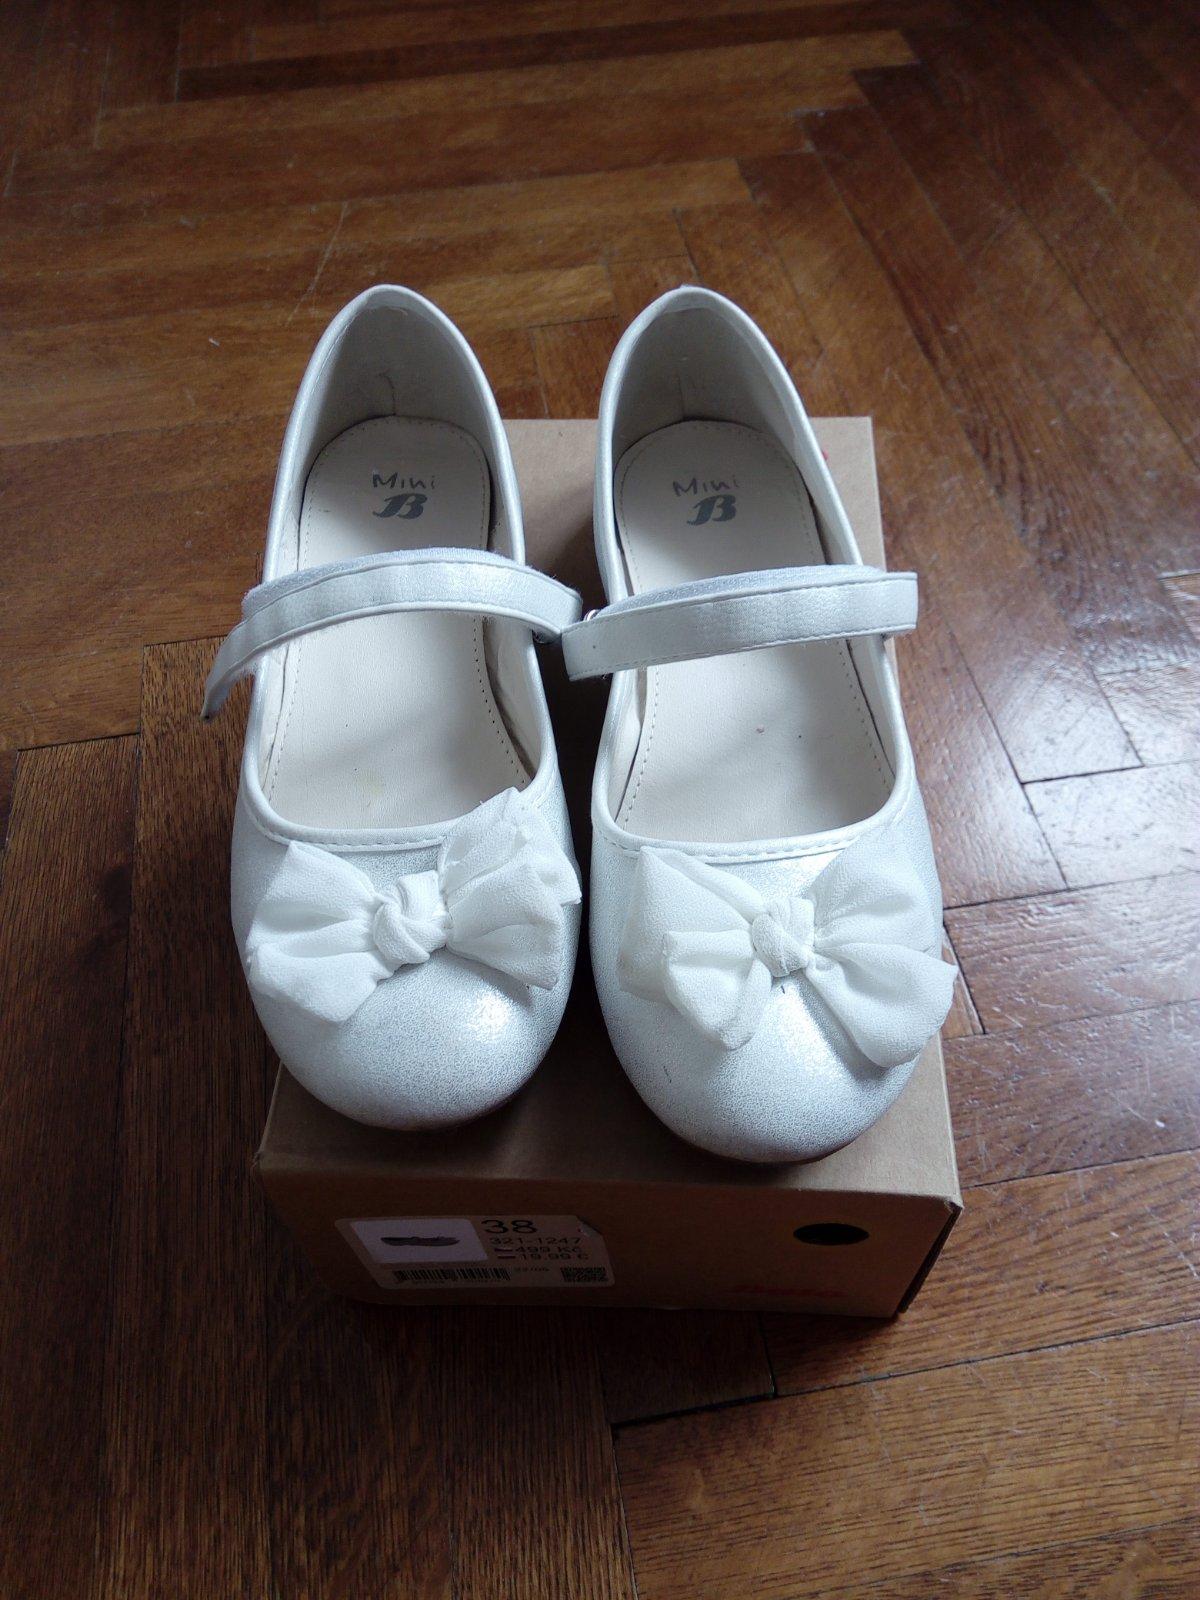 6bd7c94d33 Biele baleriny